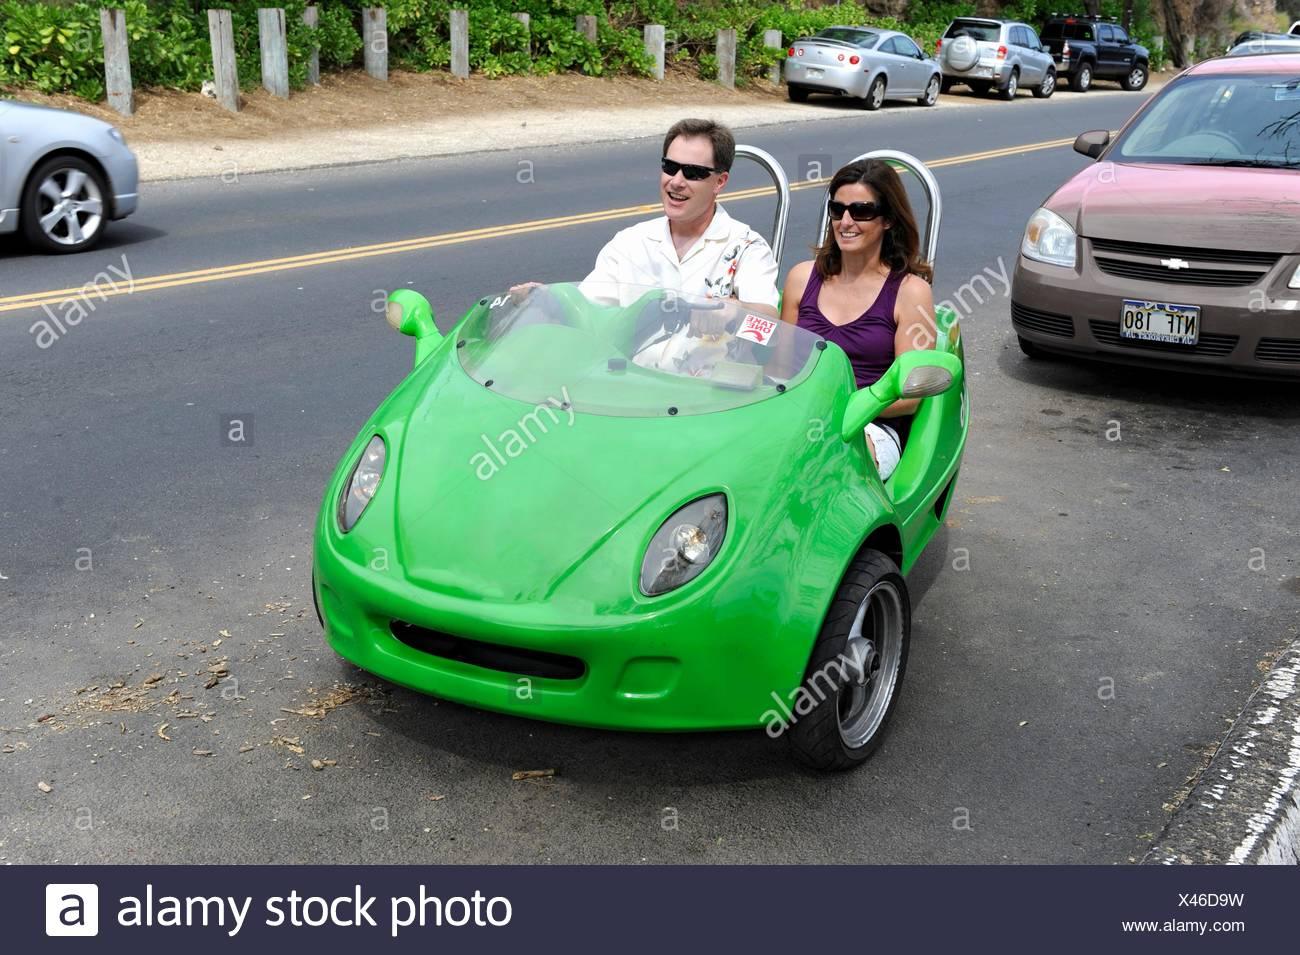 Par de mini coche de alquiler visita honolulu Oahu Hawai océano pacífico Imagen De Stock